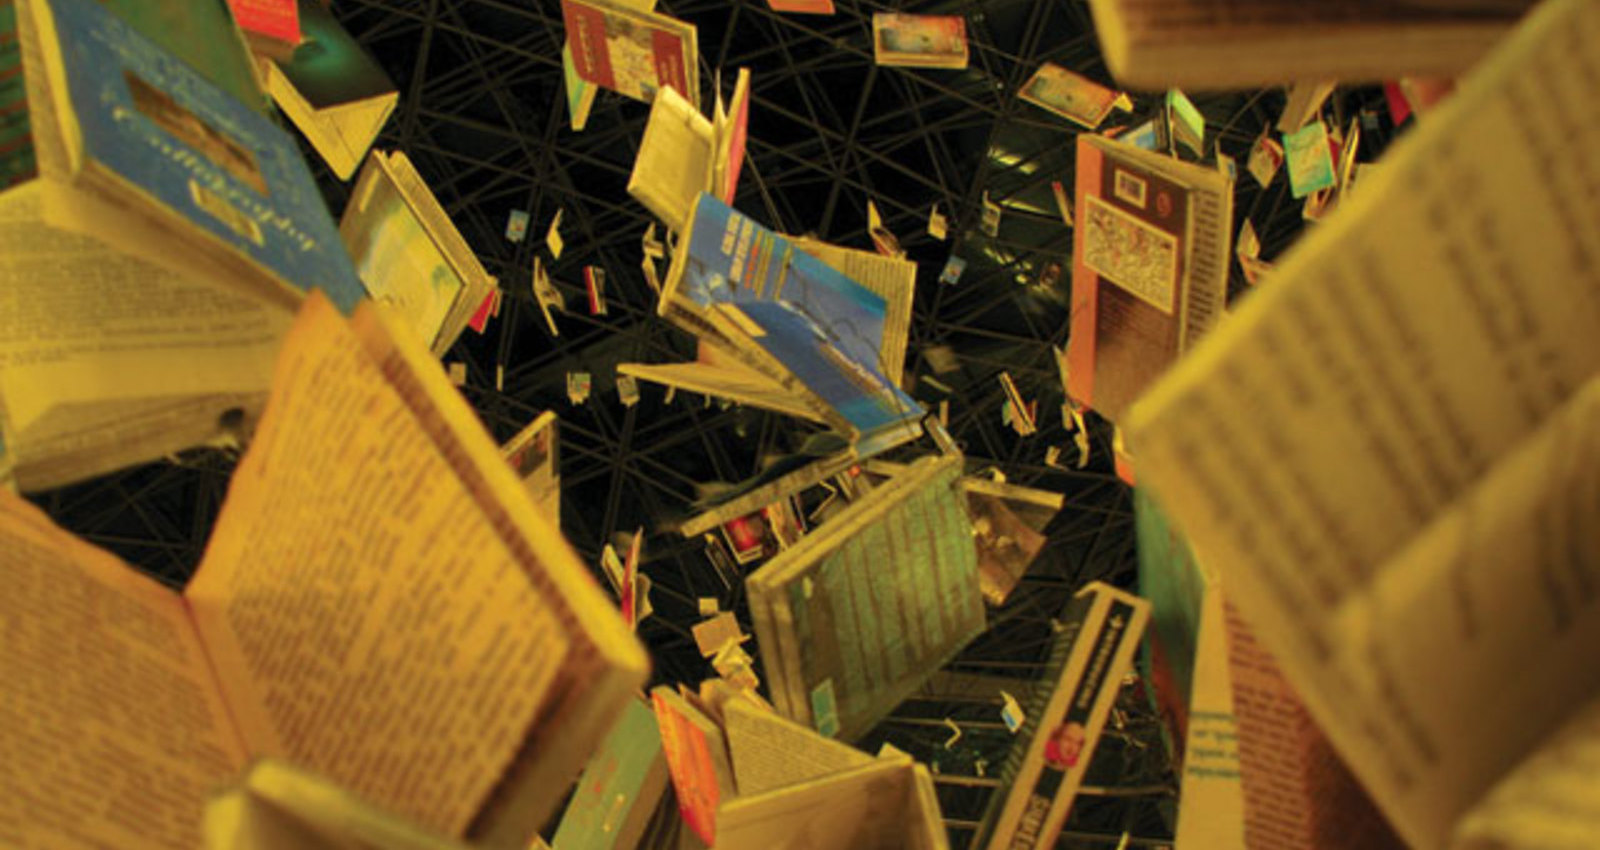 The Cascade of Books